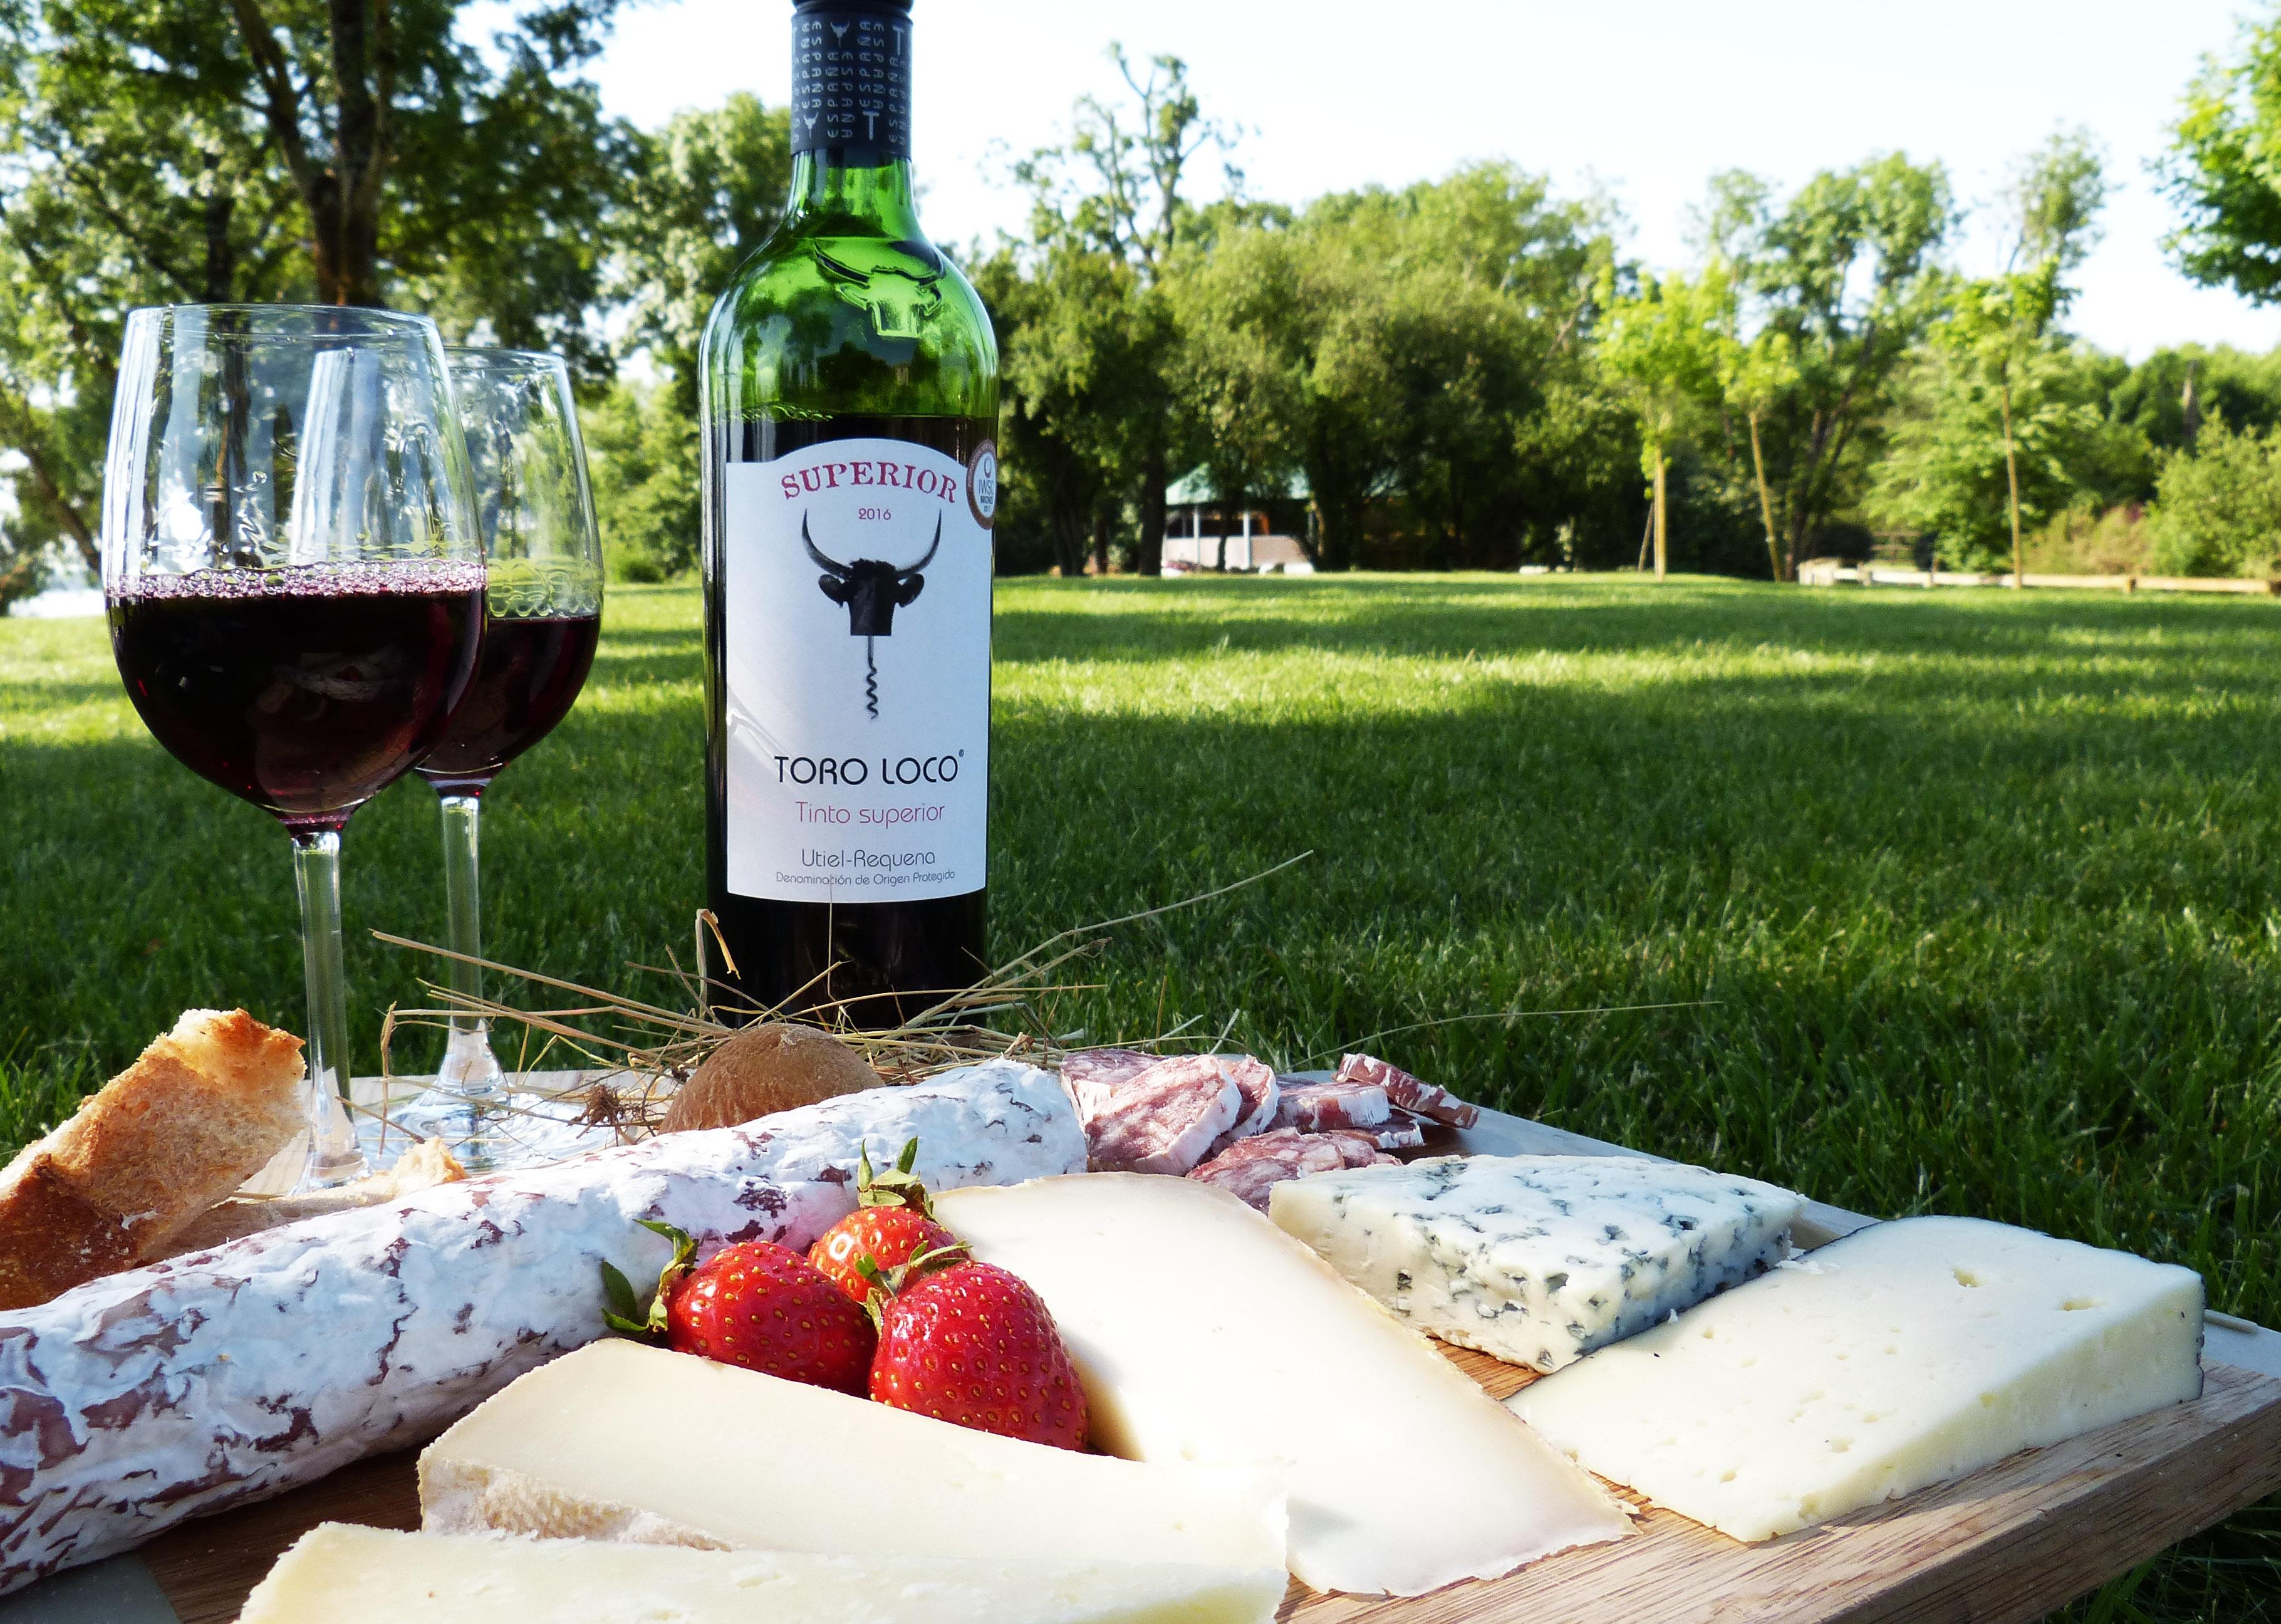 benoit-valerie-calvet-toro-loco-wine-29